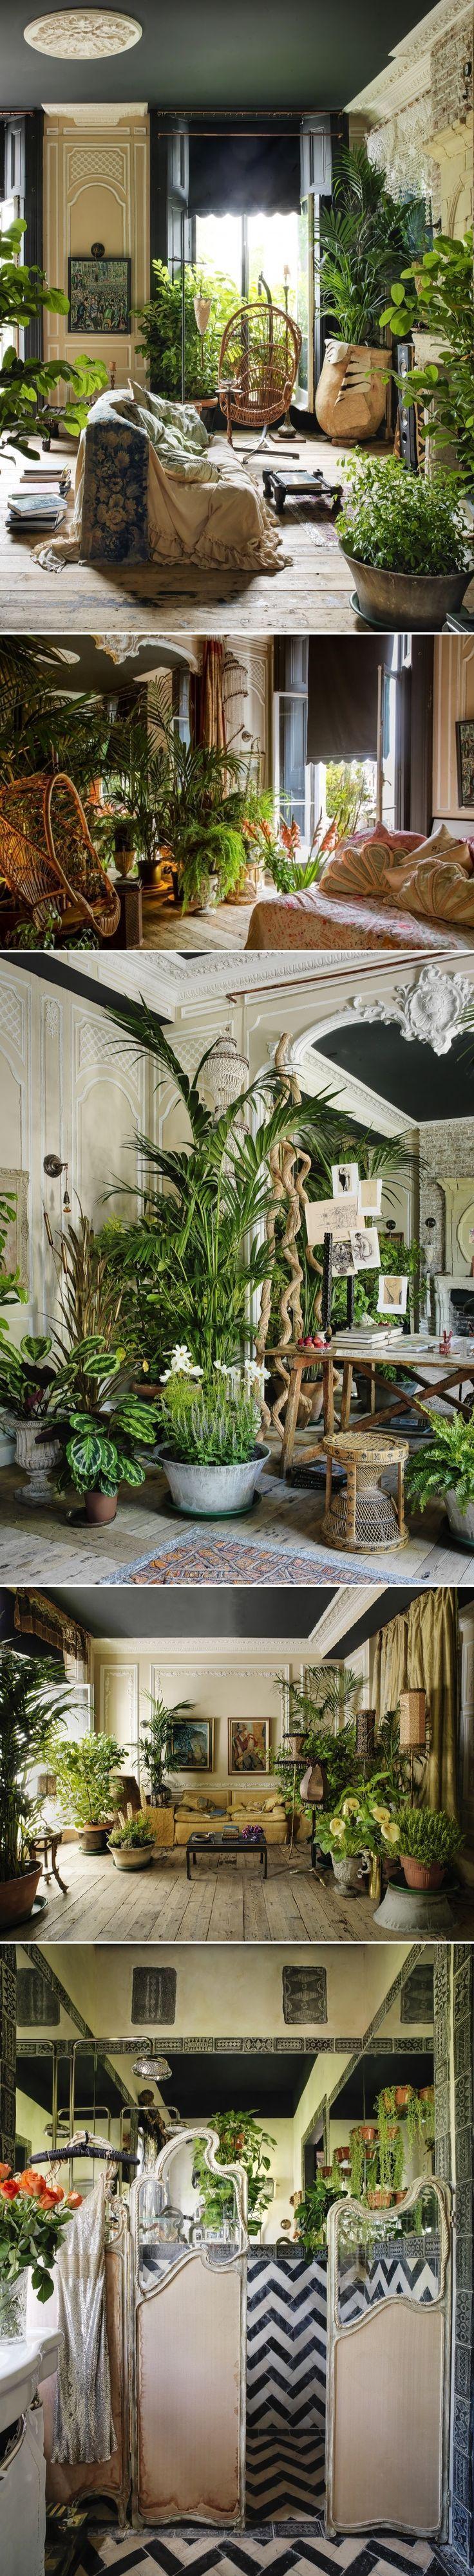 Interior designer Sera Hersham-Loftus's bohemian, plant-filled home in Little Venice, London, UK